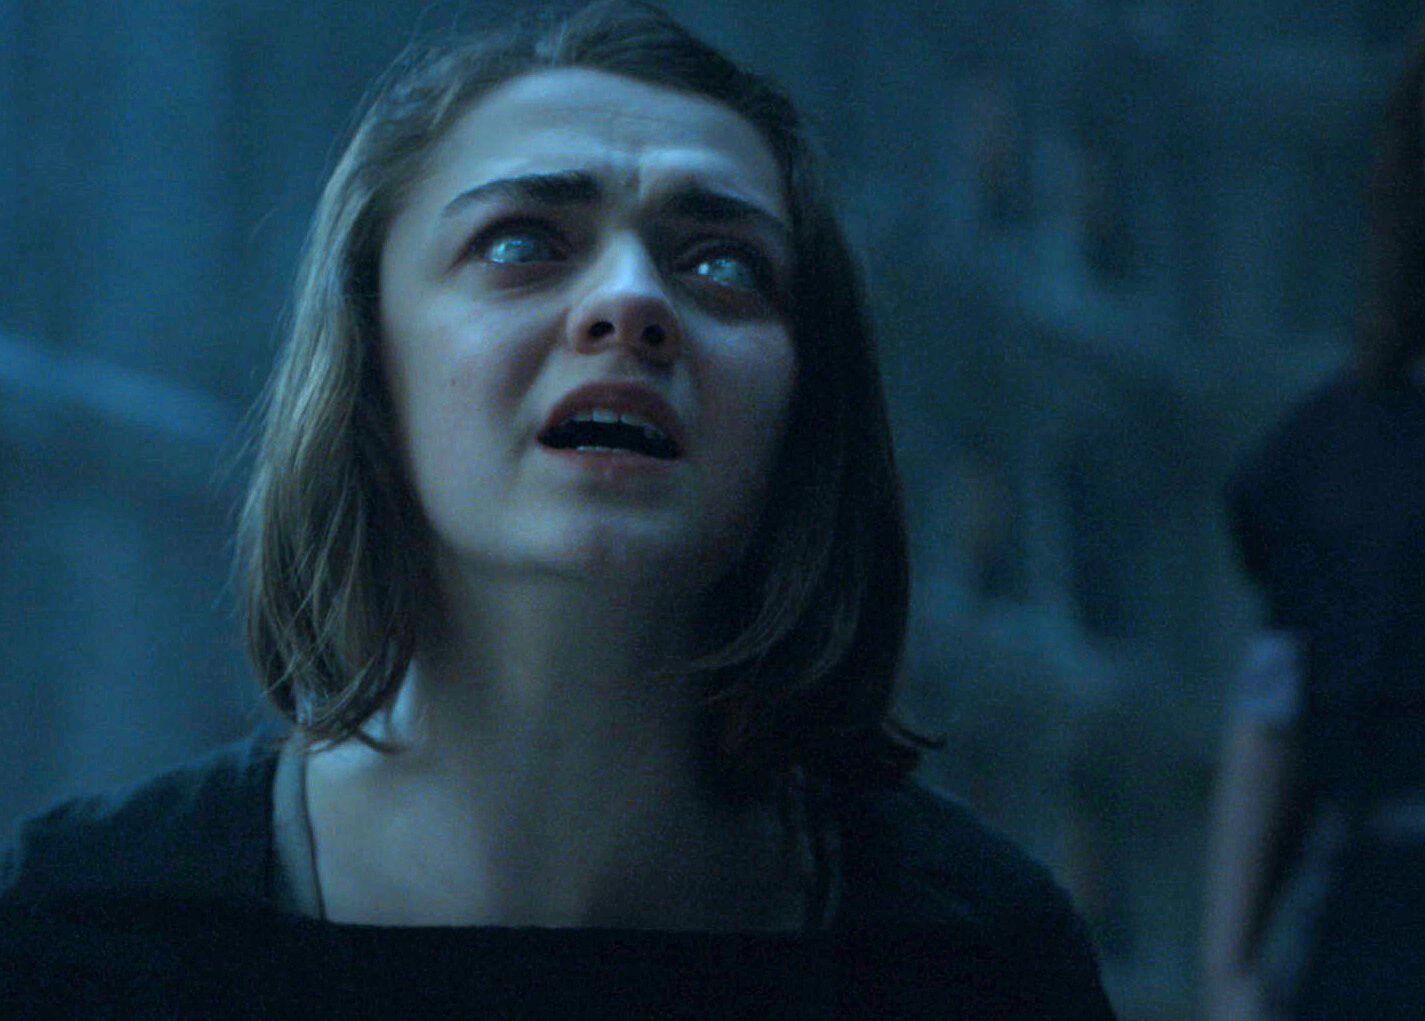 'Game of Thrones' Maisie Williams reveals her season 6